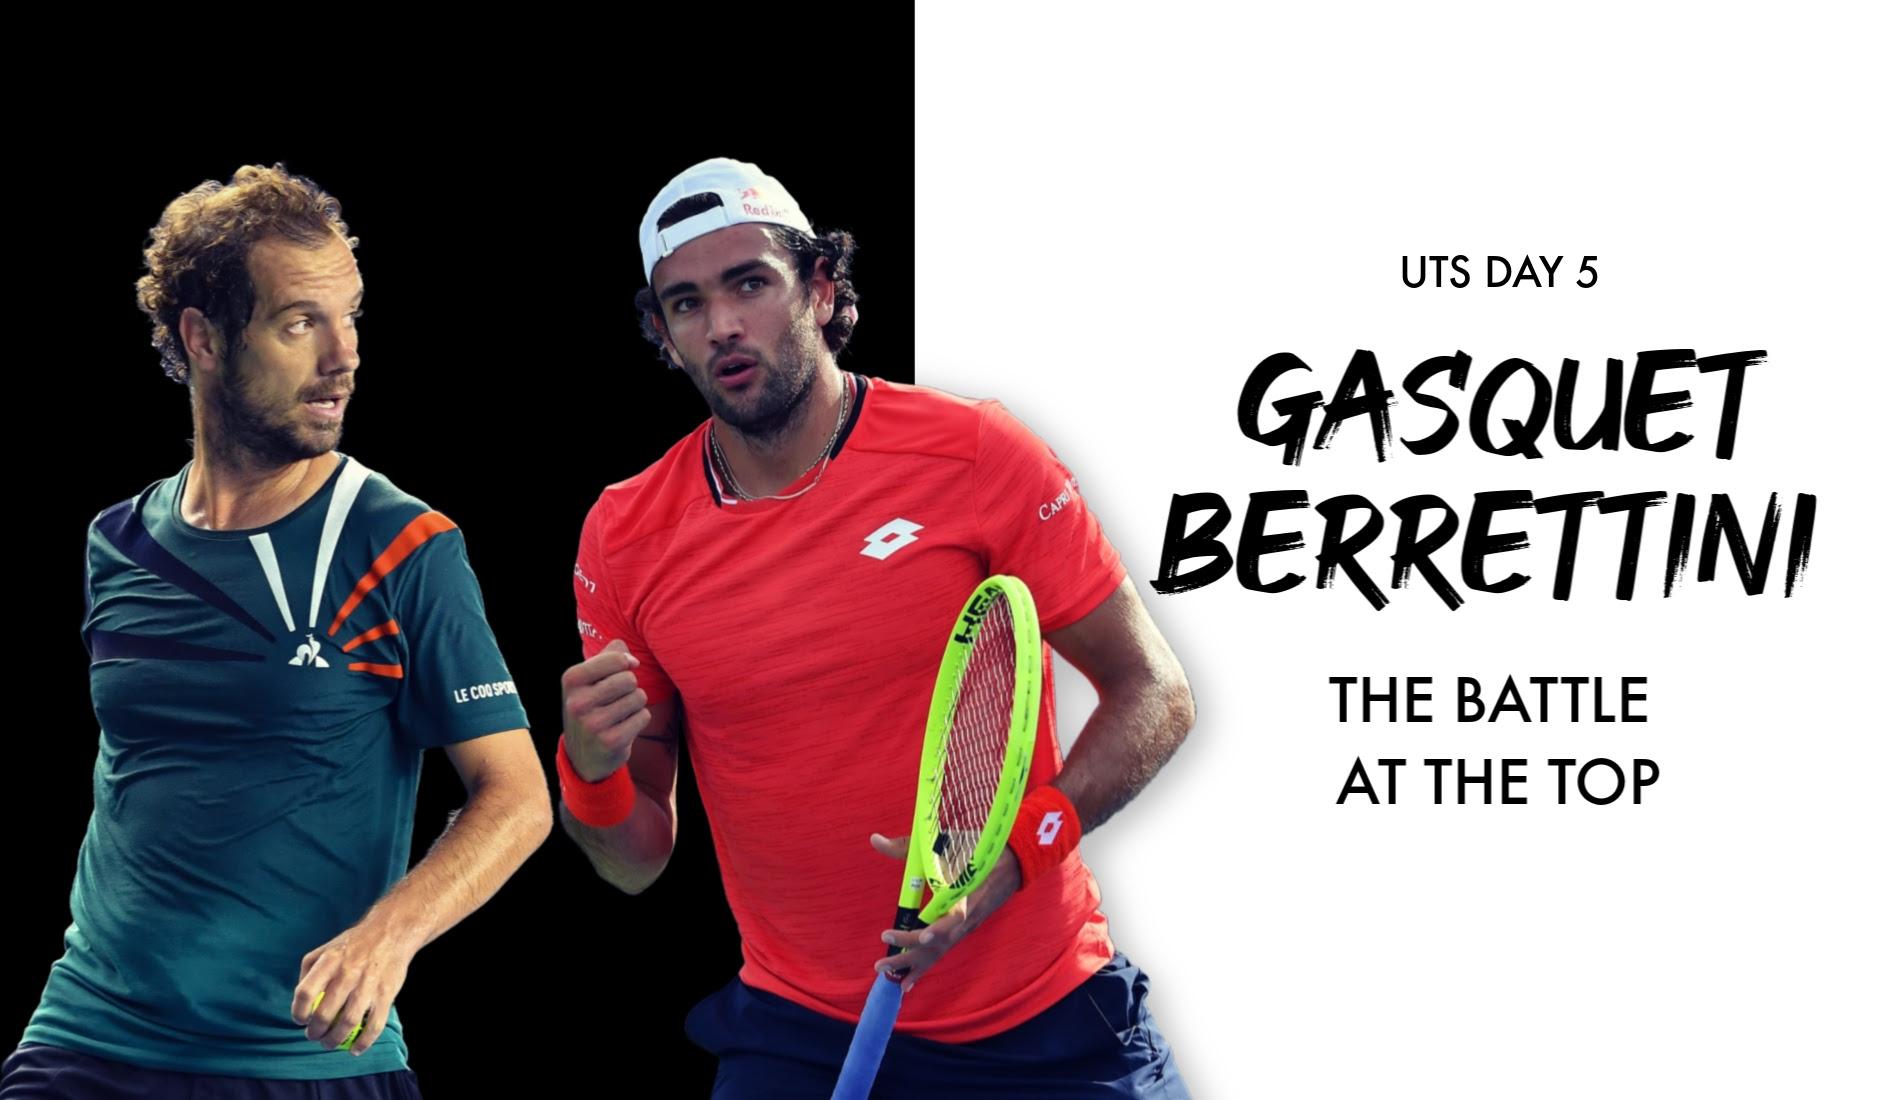 UTS1 - Day 5 Preview: Richard Gasquet vs Matteo Berrettini